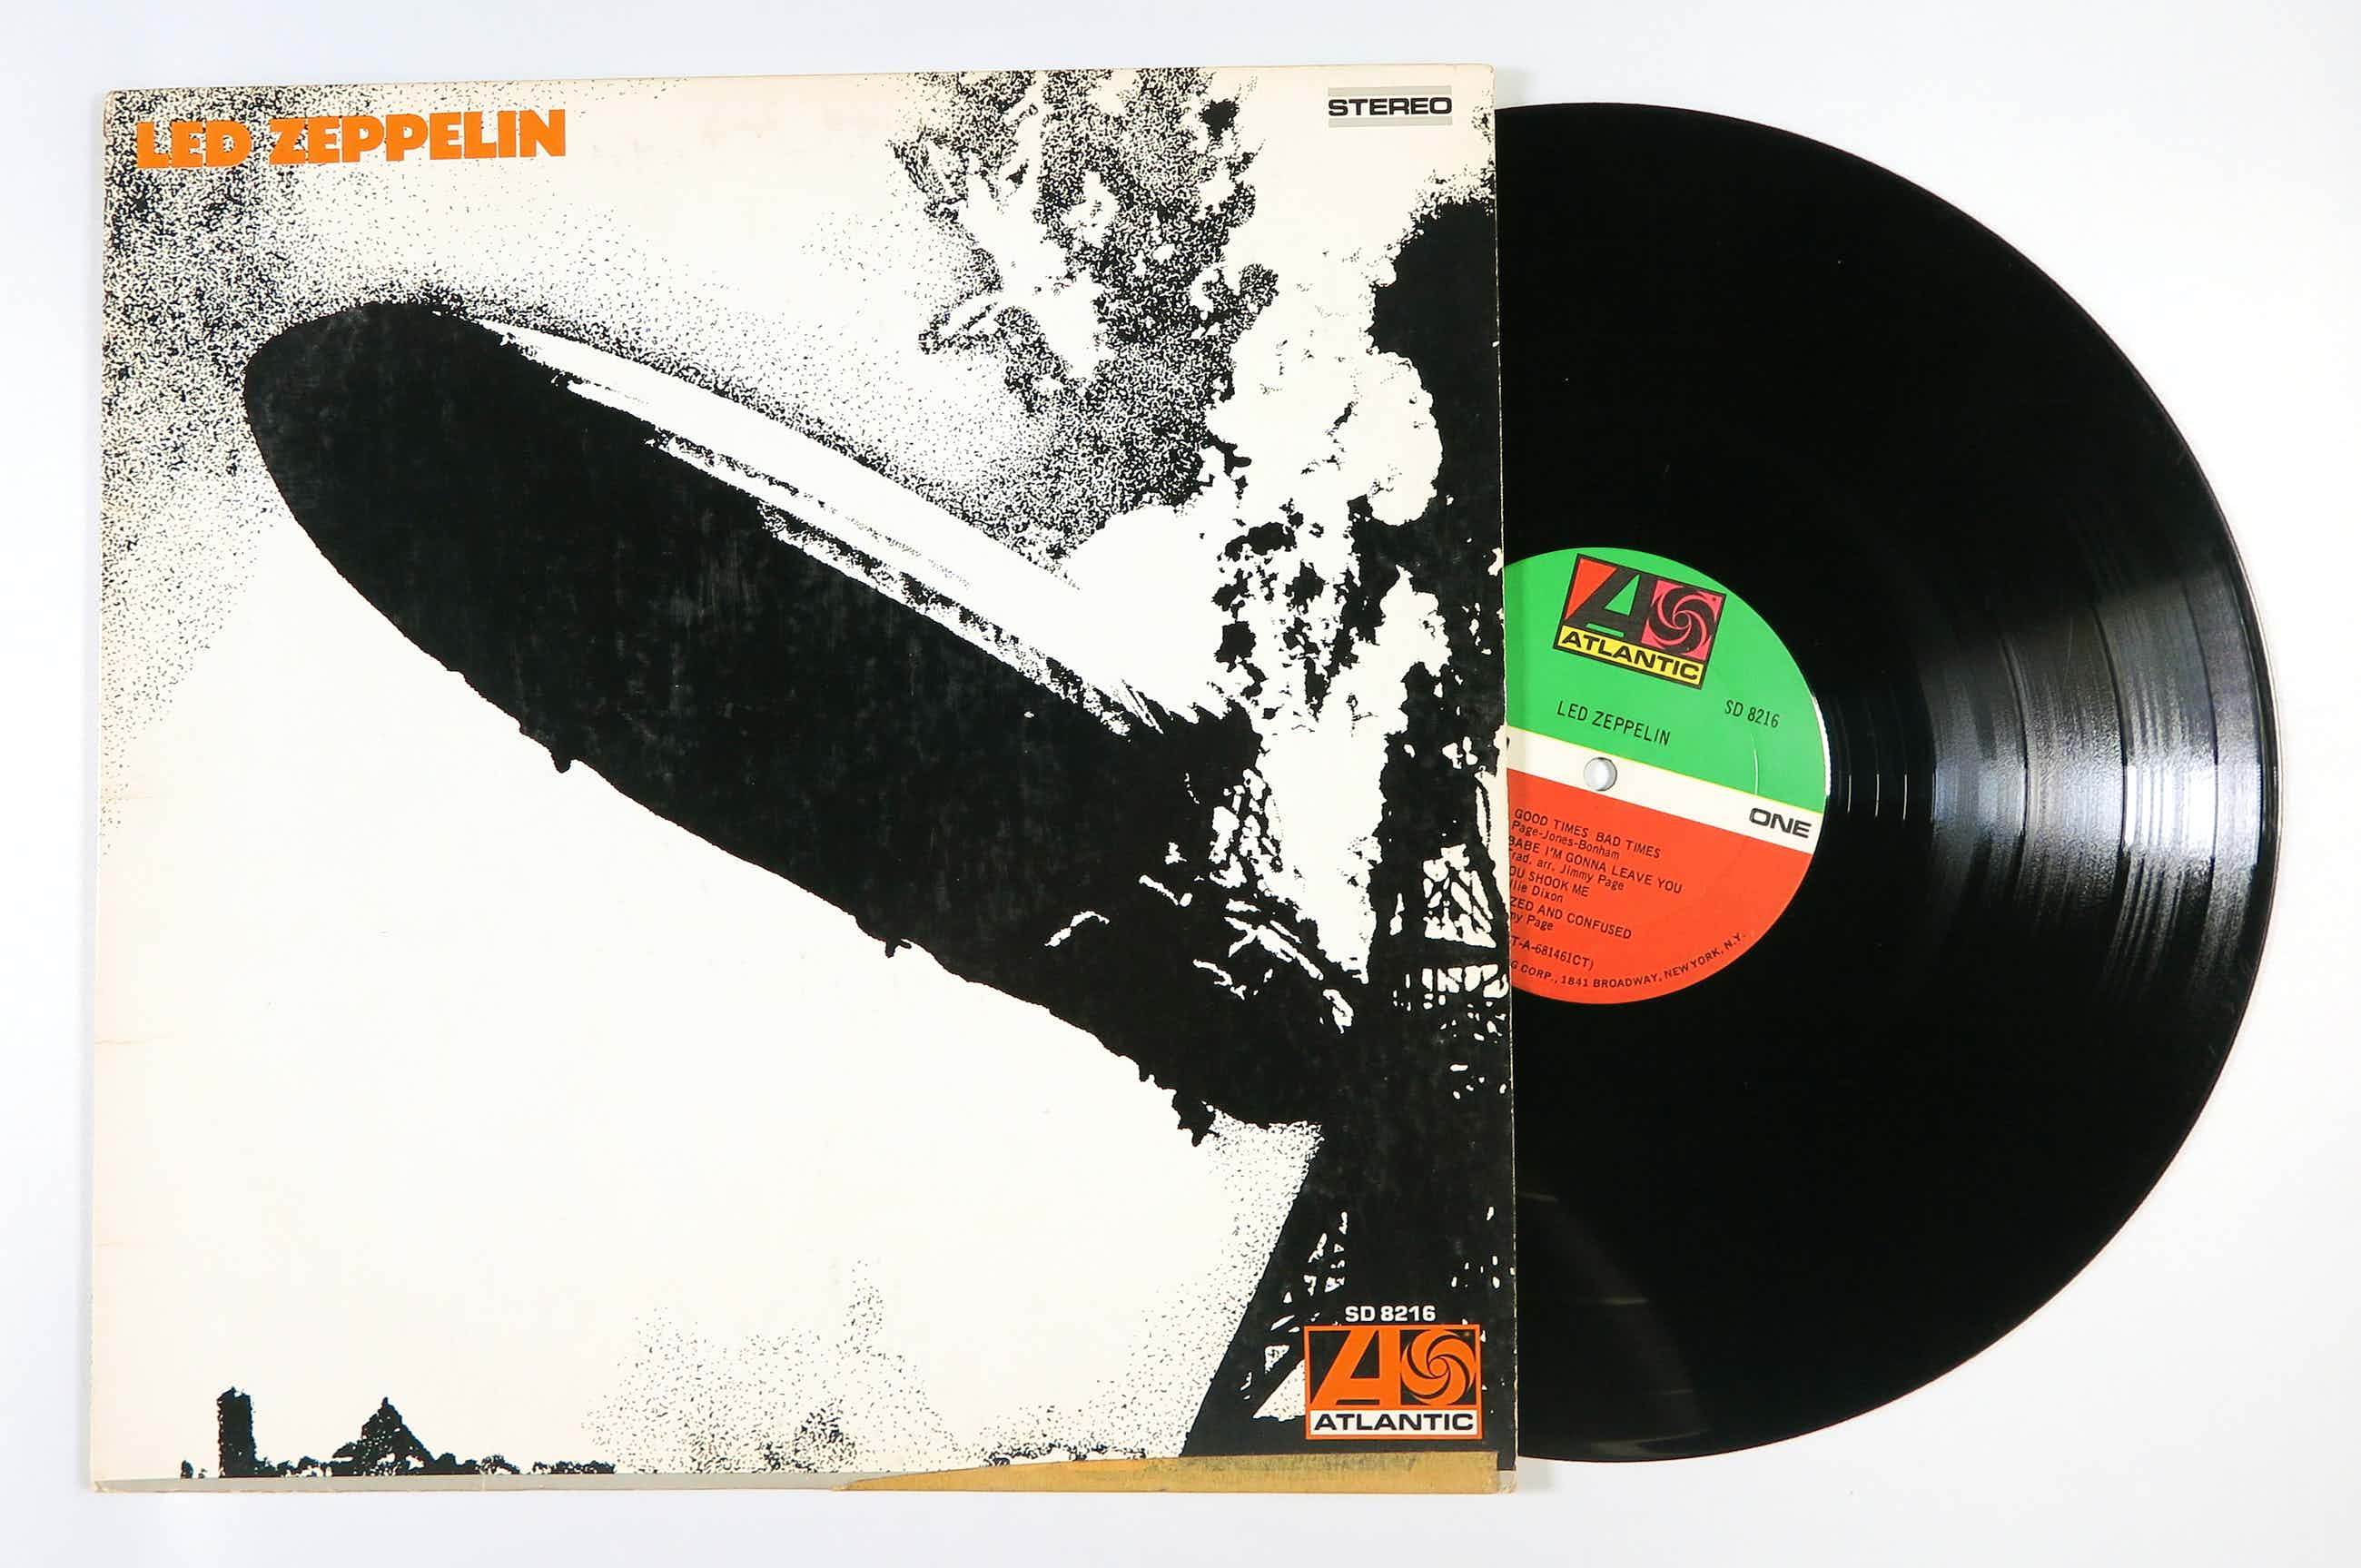 Led Zeppelin - Led Zeppelin kopen? Bied vanaf 18!